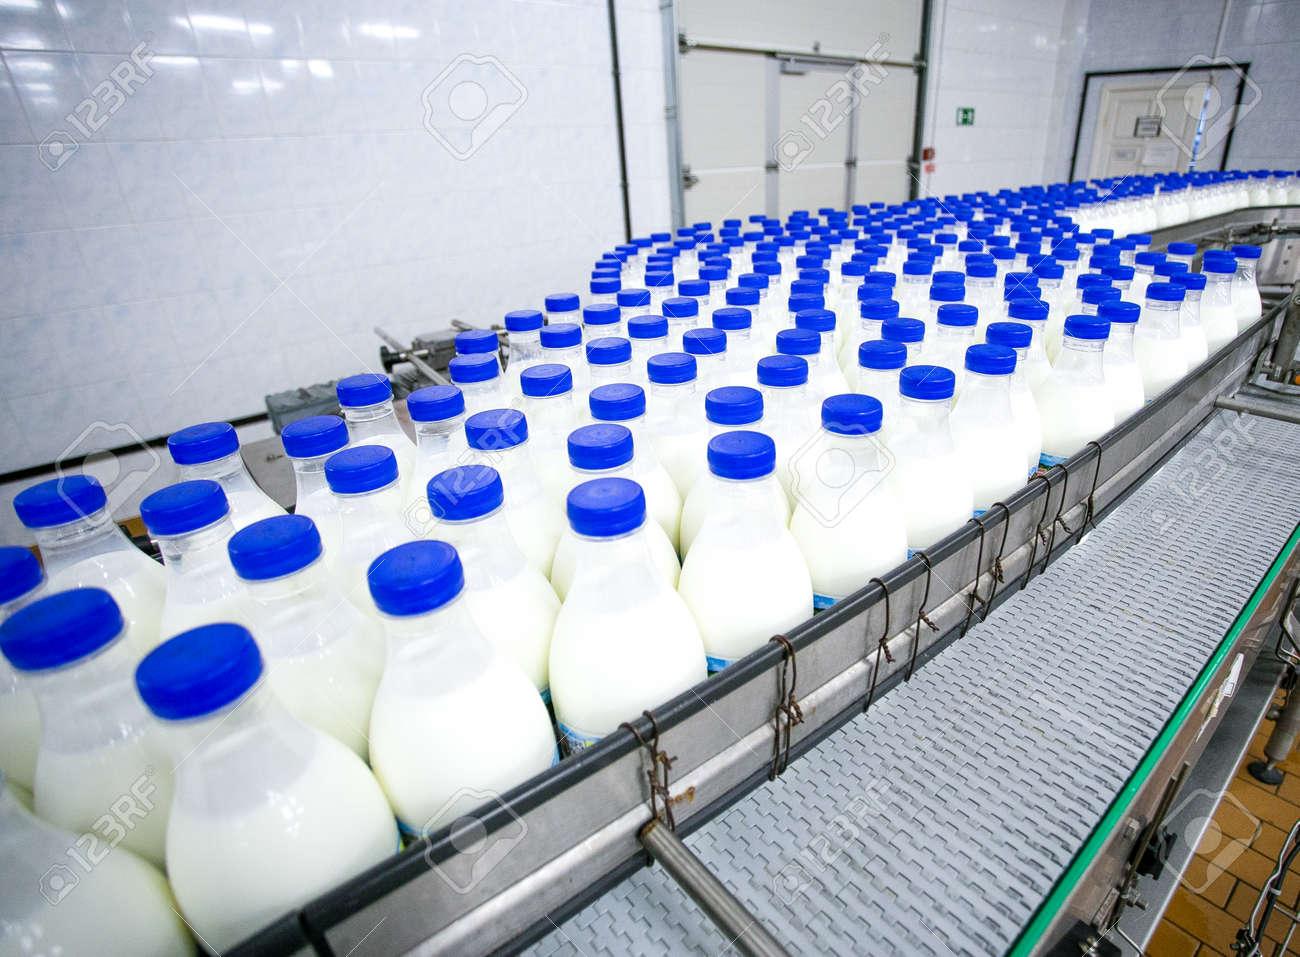 Dairy plant, conveyor with milk bottles in food factory - 53401438